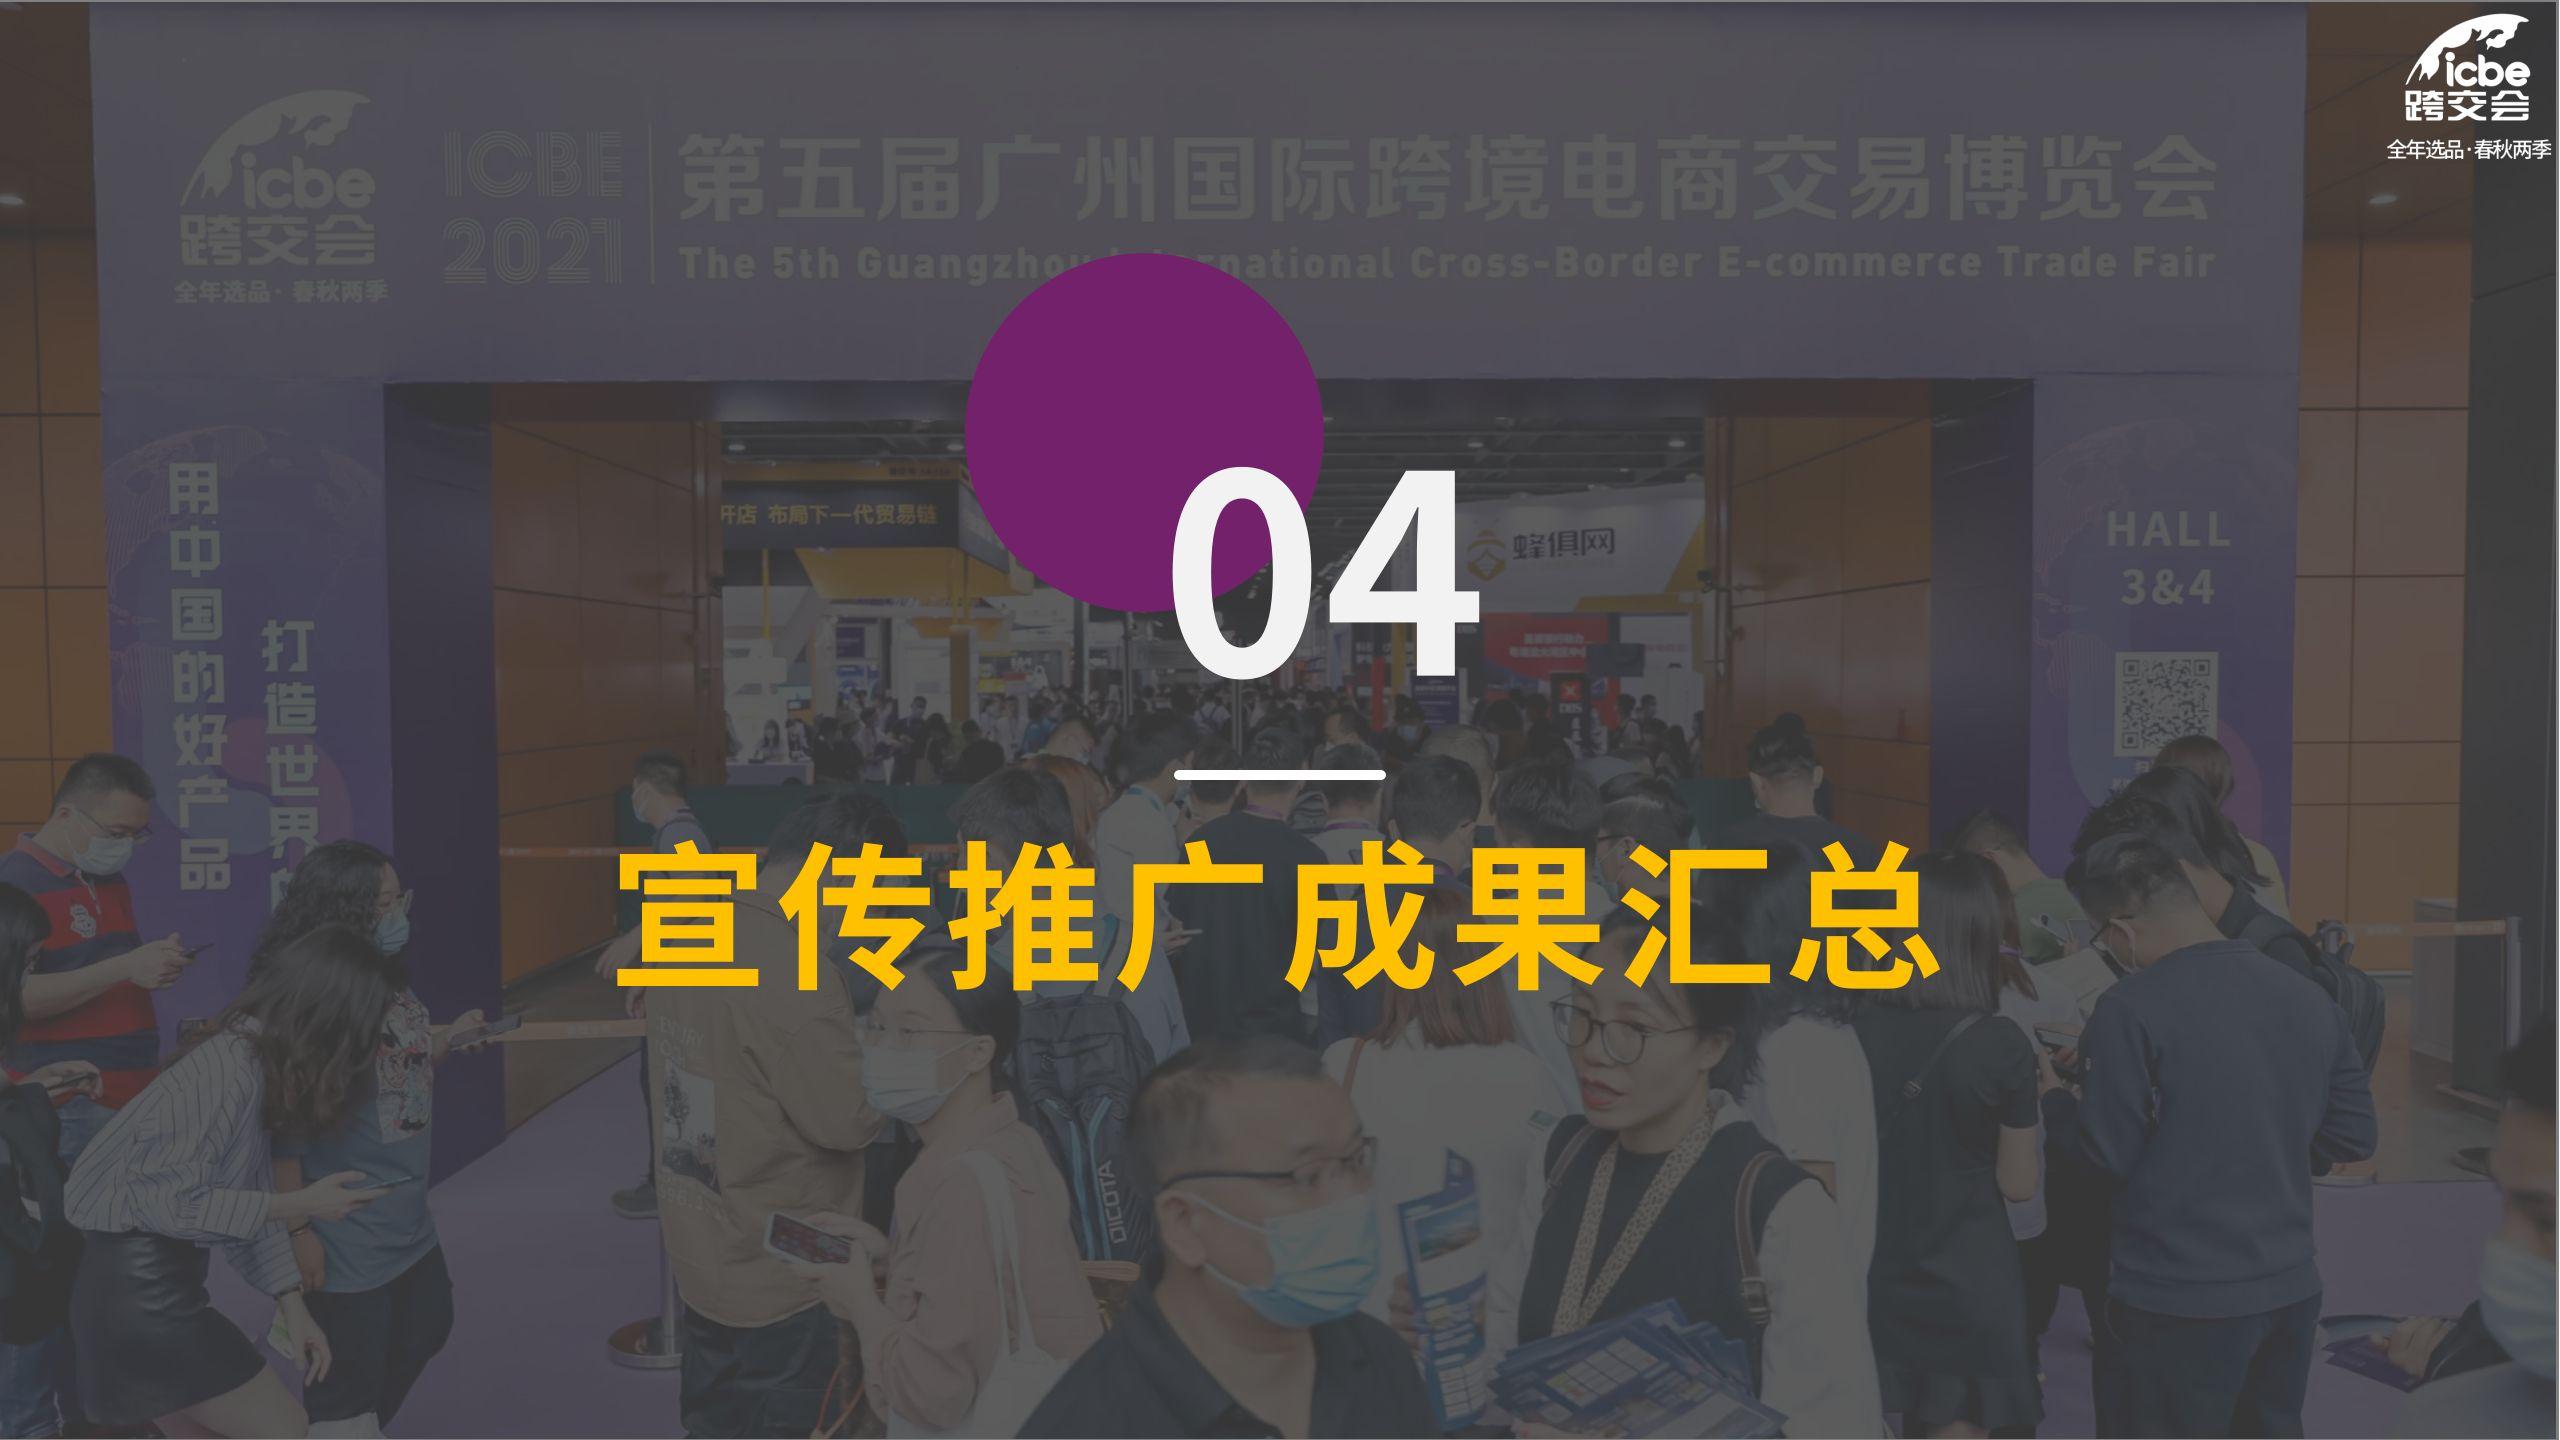 广州展后报告.png